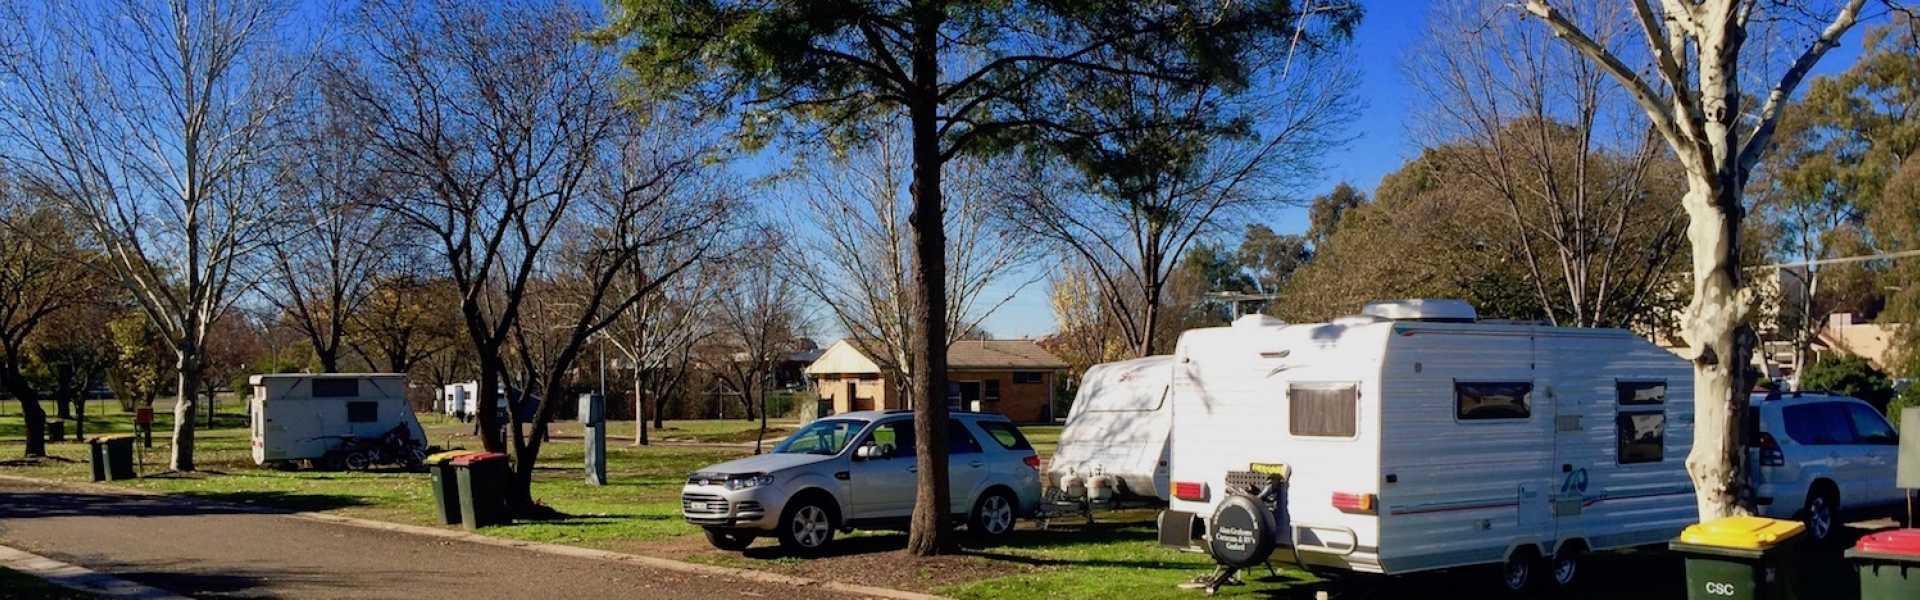 Kui Parks, Cootamundra Caravan Park, Sites